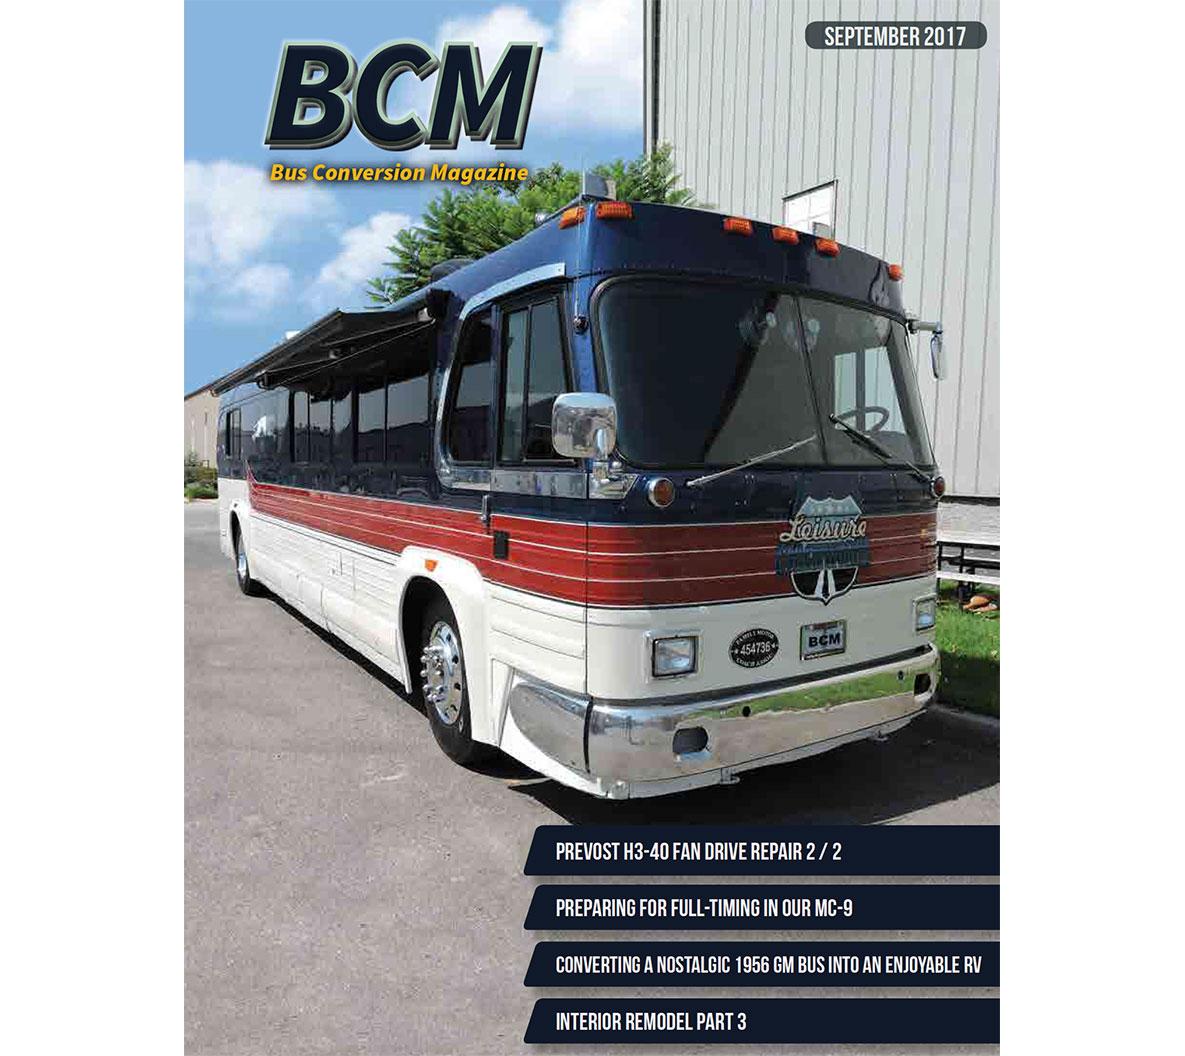 BCM-2017-09-1185x1056